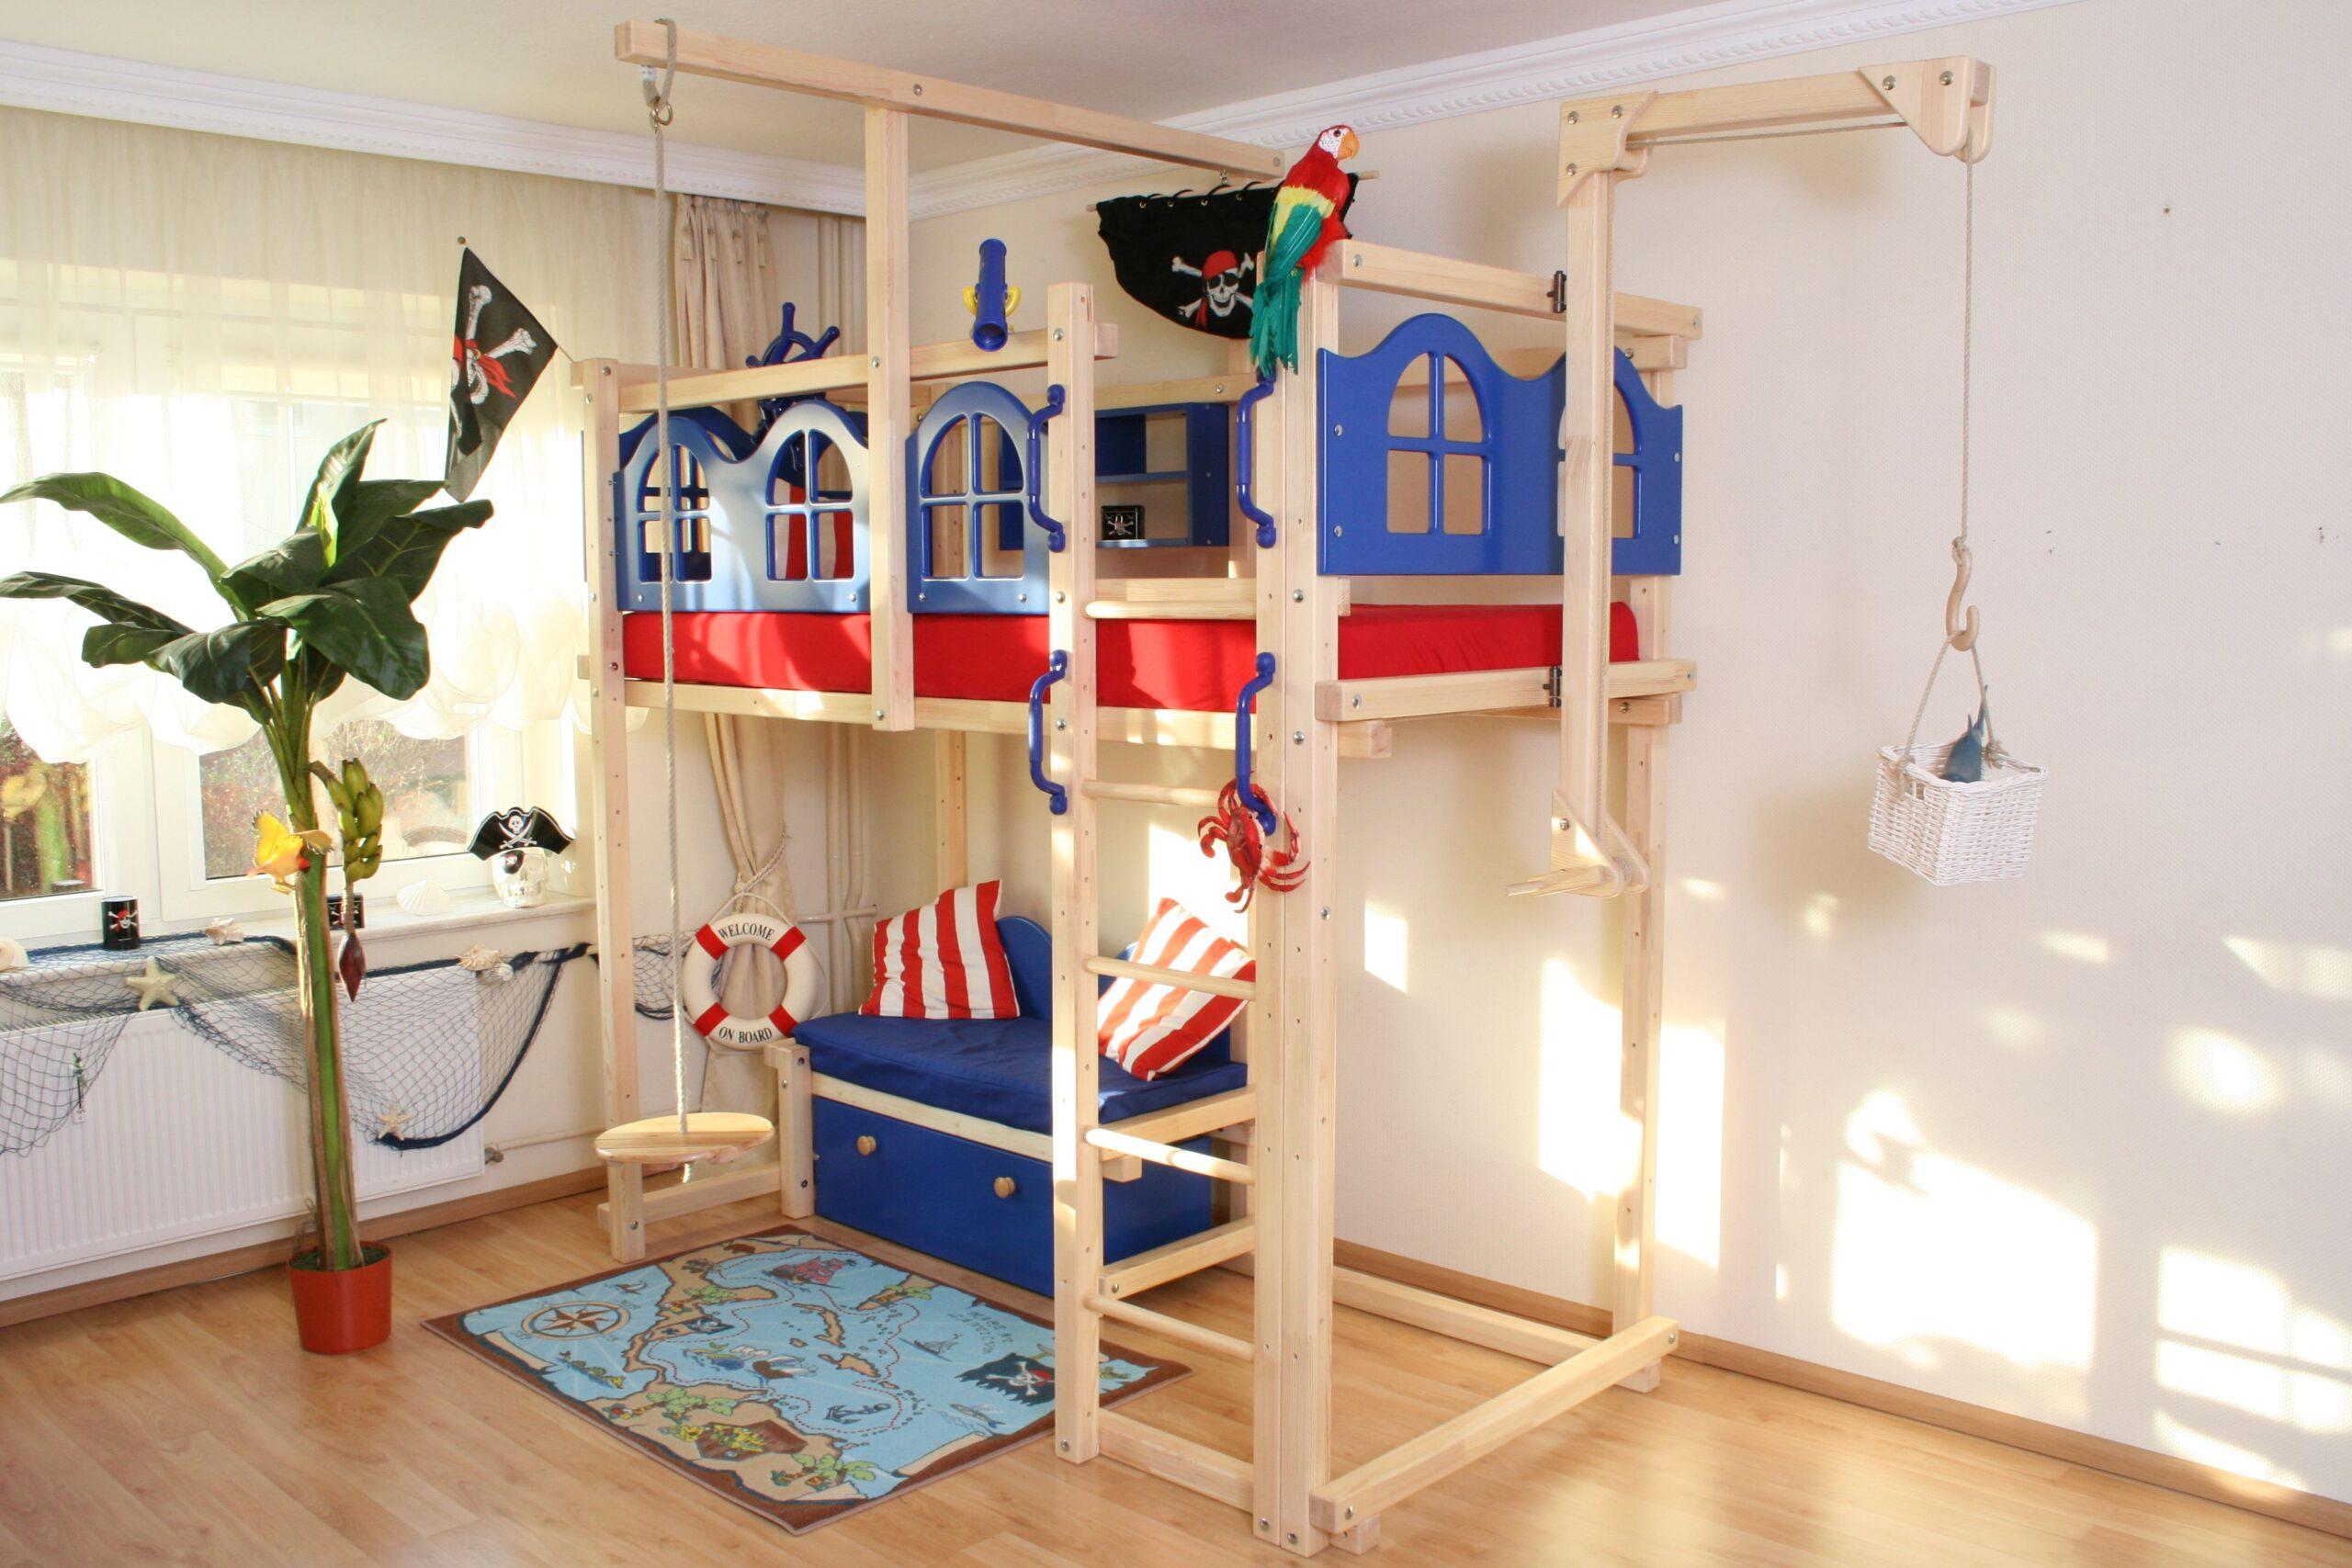 Full Size of Piraten Hochbett Oliniki Regale Kinderzimmer Sofa Regal Weiß Kinderzimmer Piraten Kinderzimmer